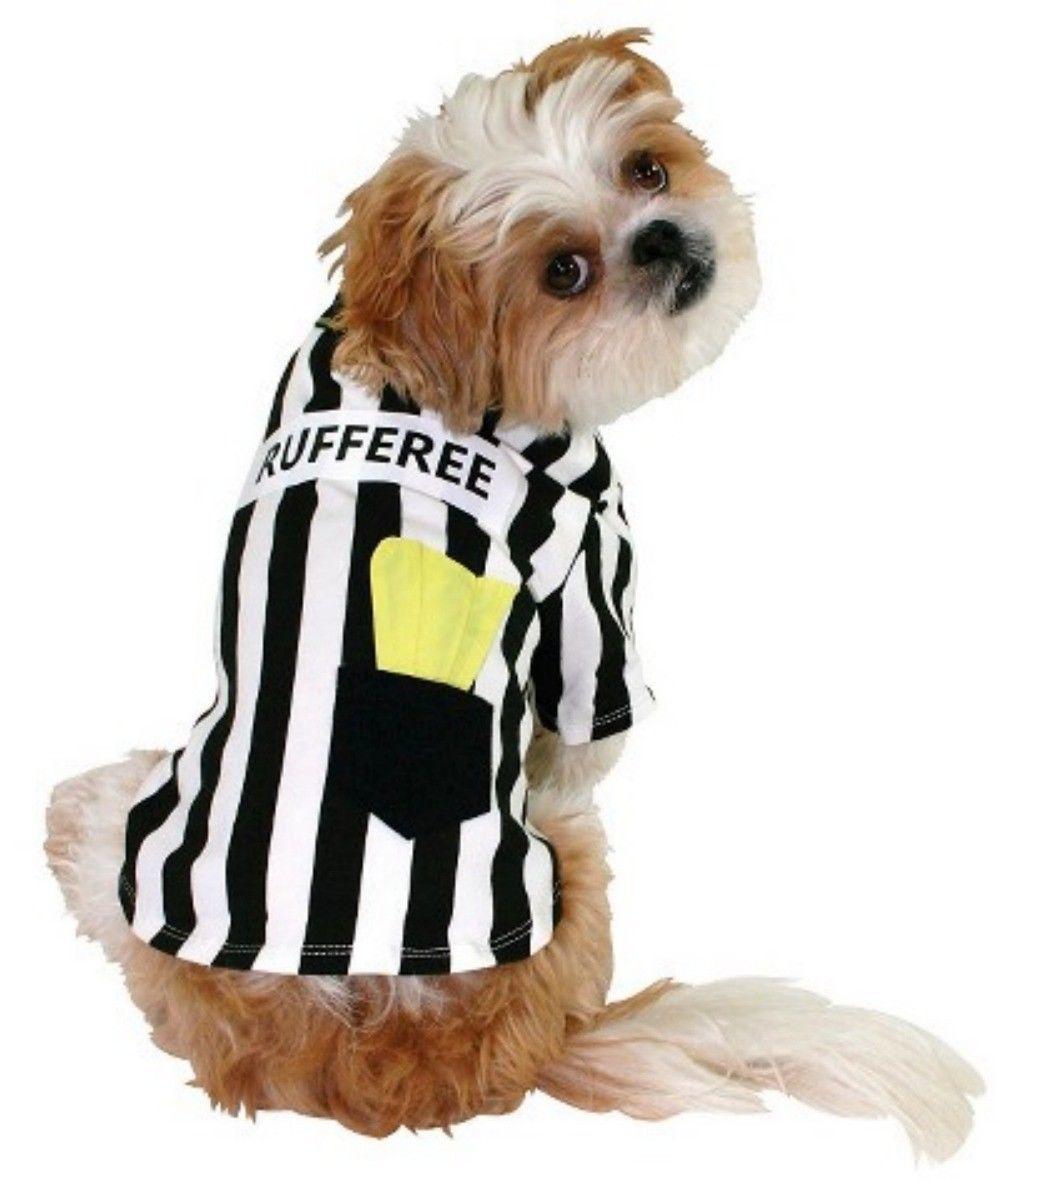 DOG HALLOWEEN COSTUME-PET T-SHIRT FOOTBALL RUFFEREE SOCCER SPORT MASCOT S-XS NEW